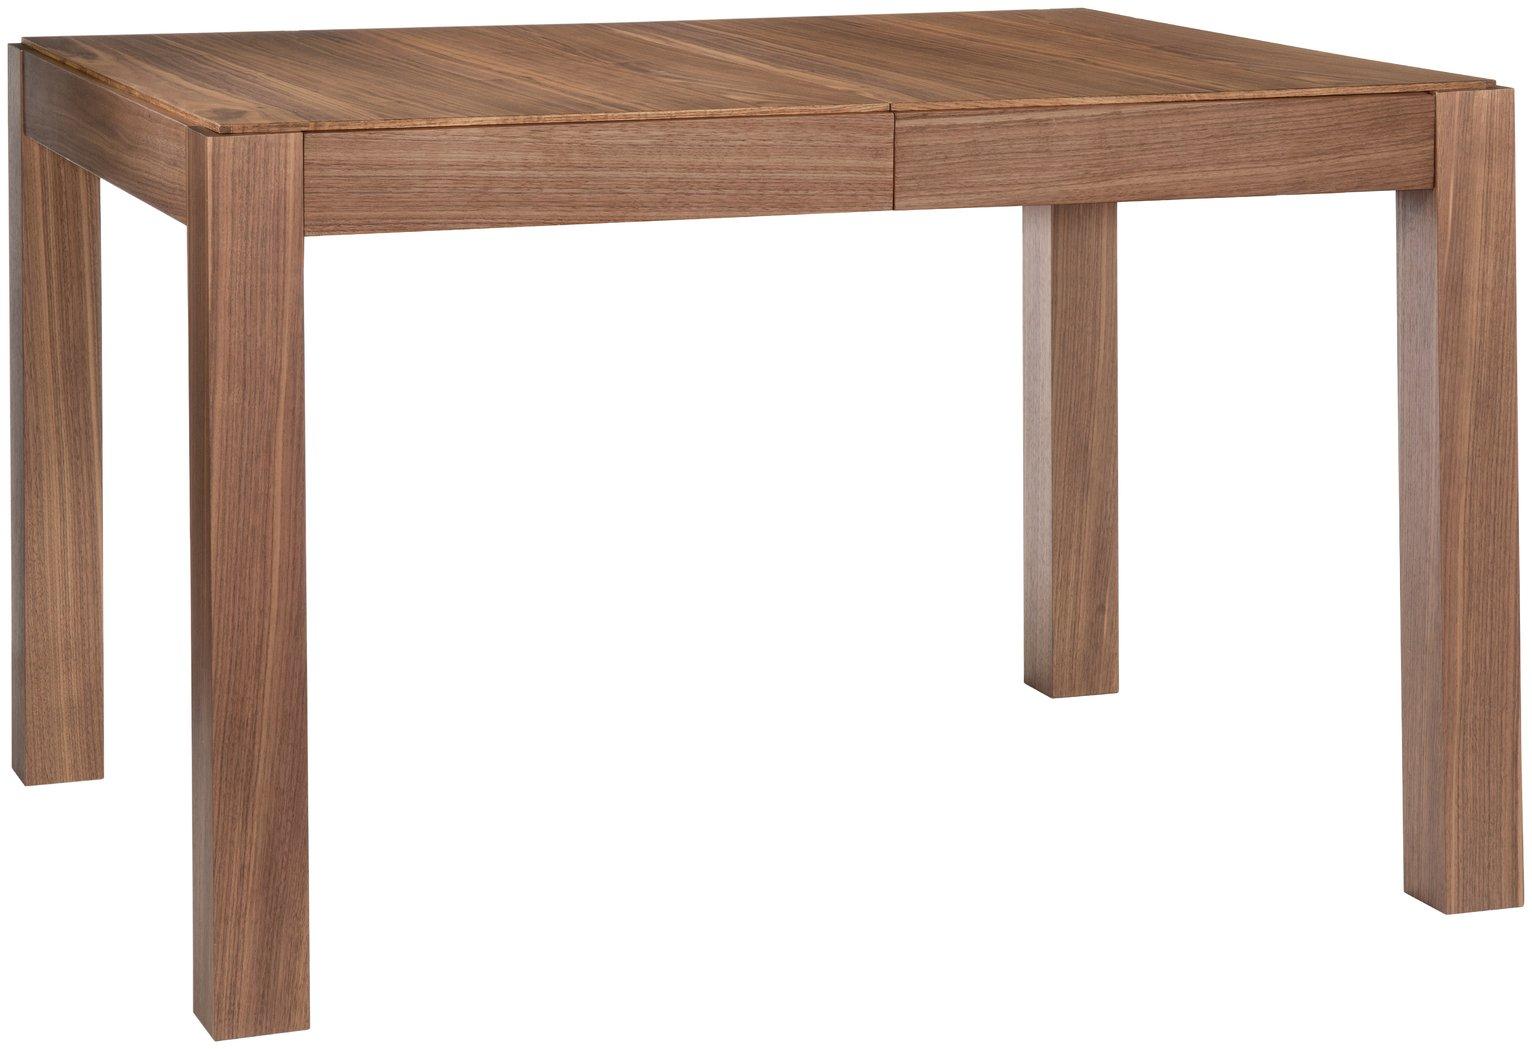 Habitat Drio Extending Walnut 4-10 Seater Dining Table